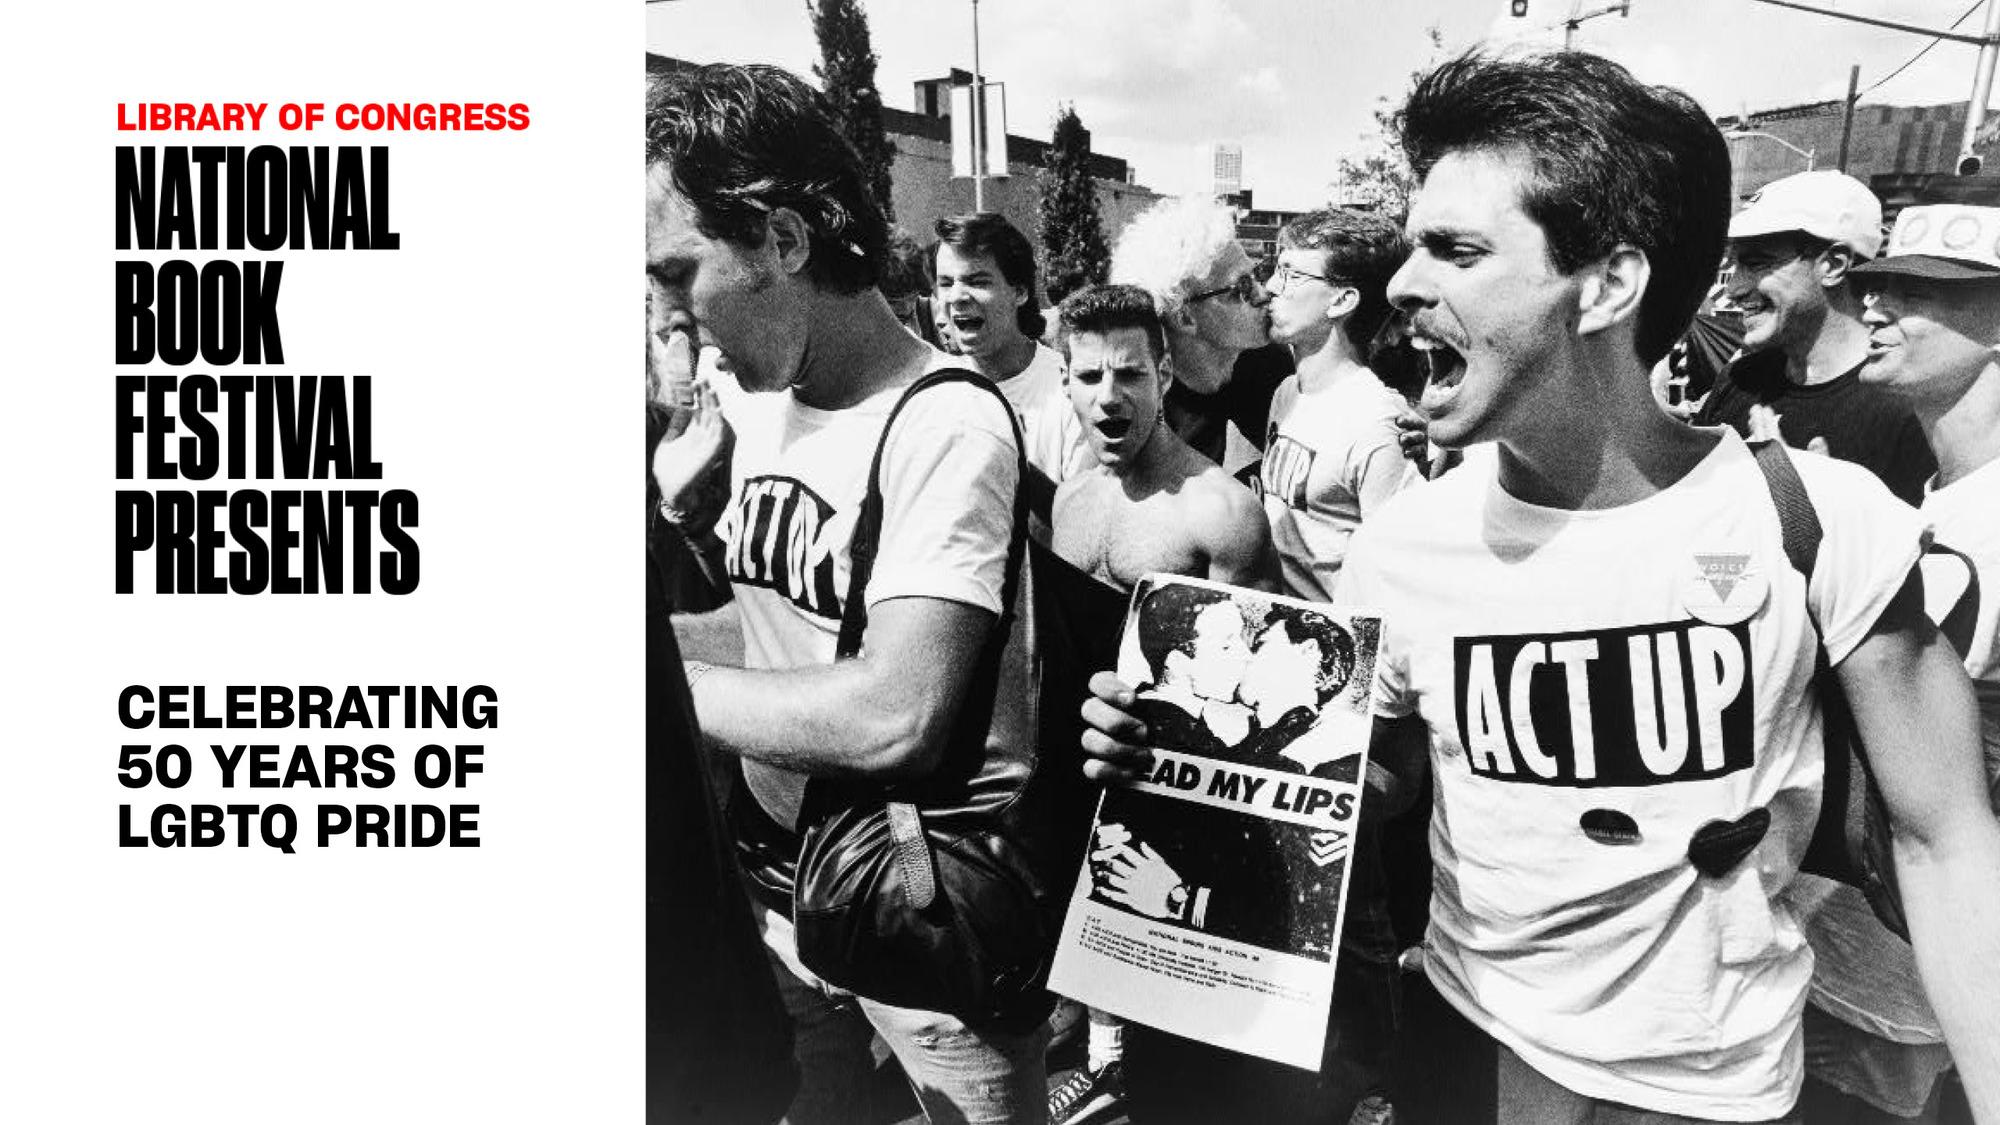 50 Years of LGBTQ Pride